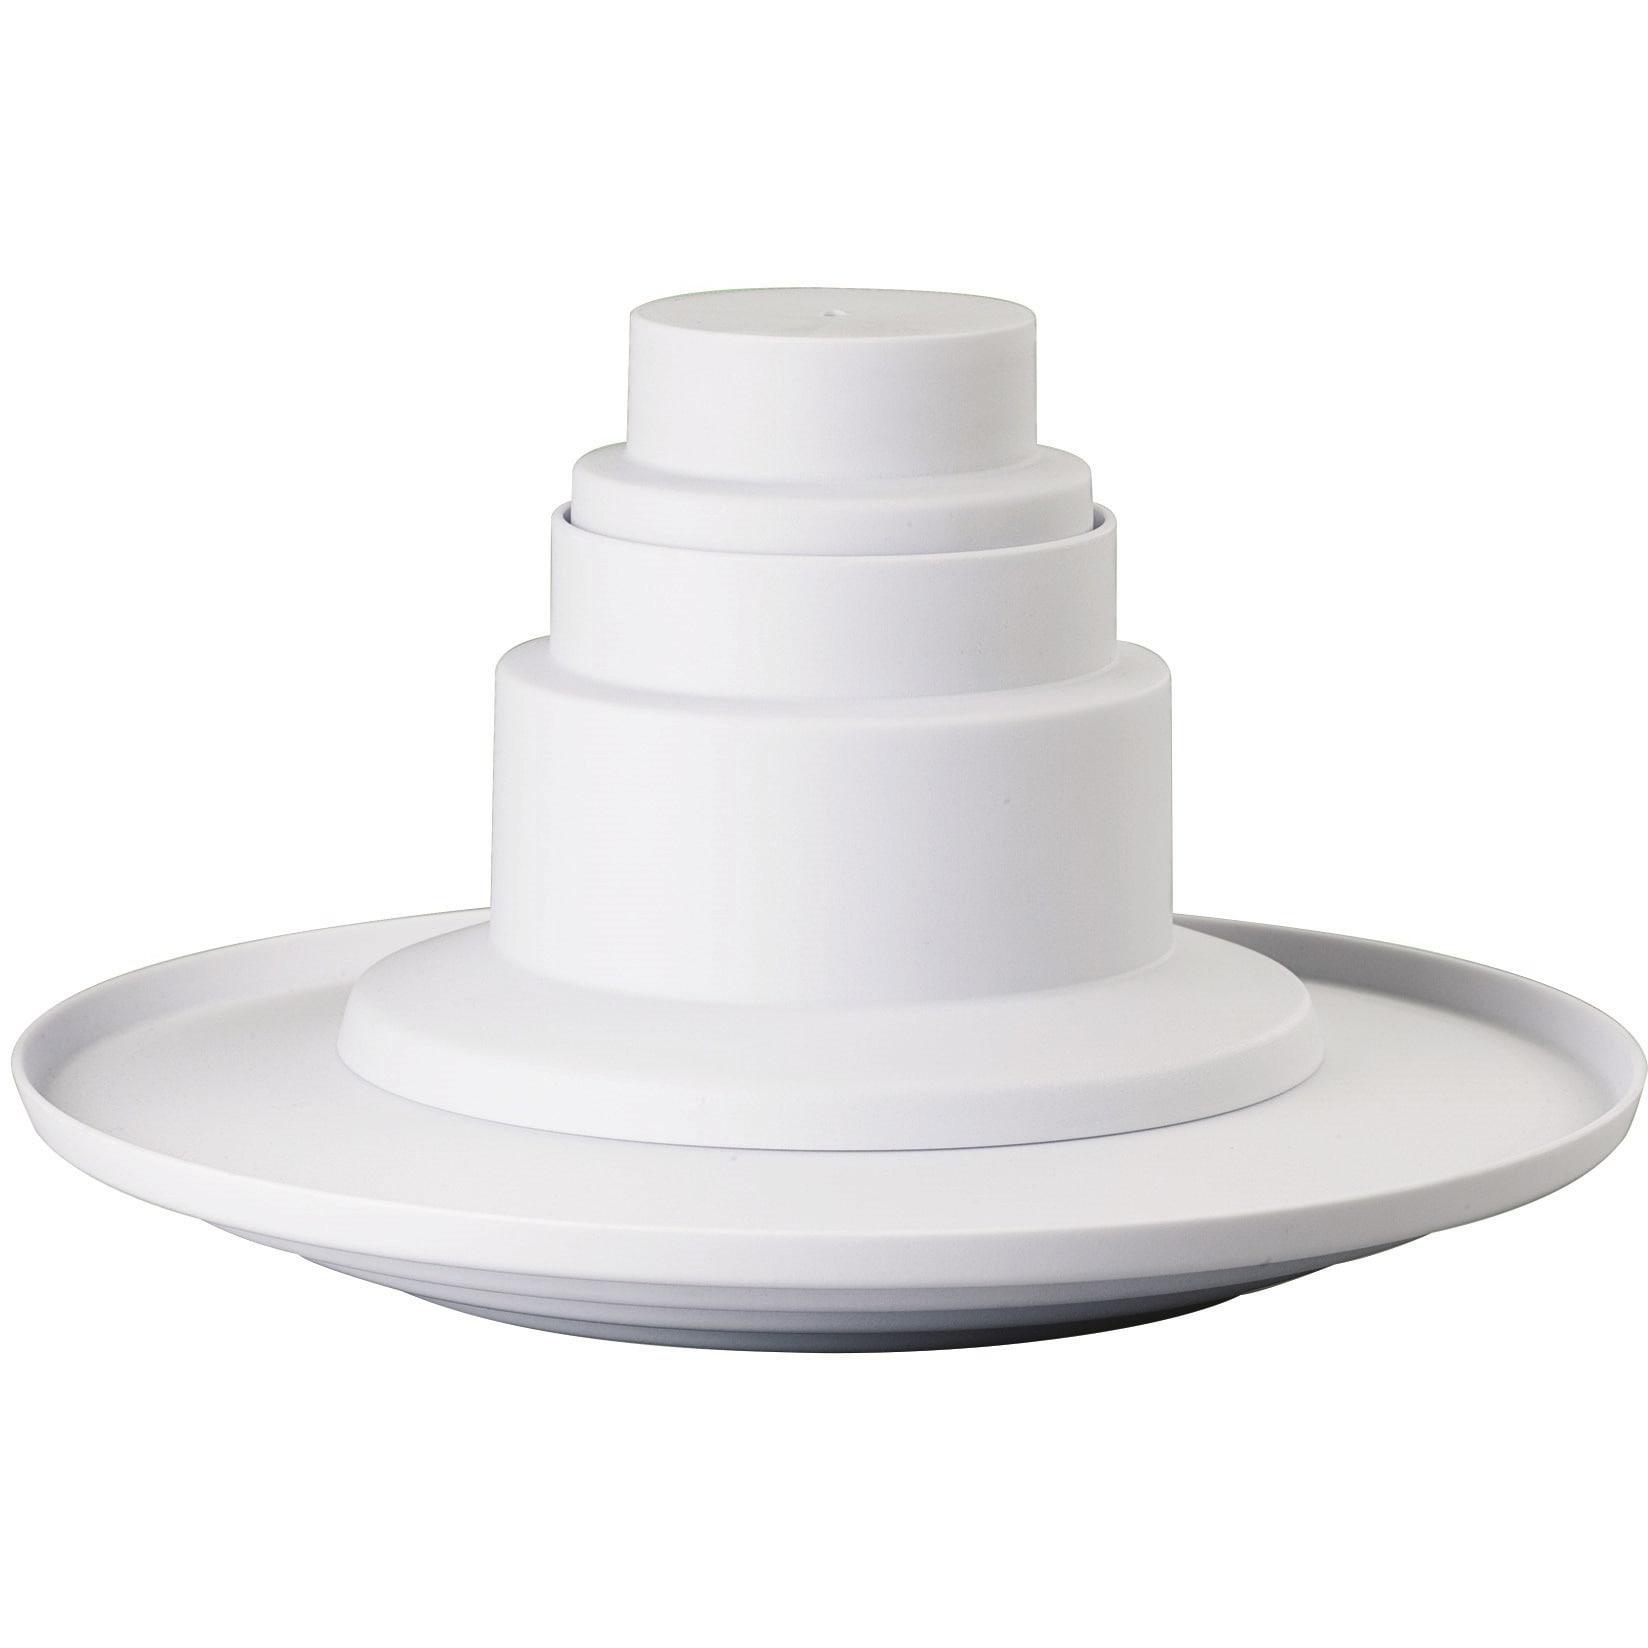 Wilton 4-tier Dessert Tower/ Cupcake Stand, White (Plastic)